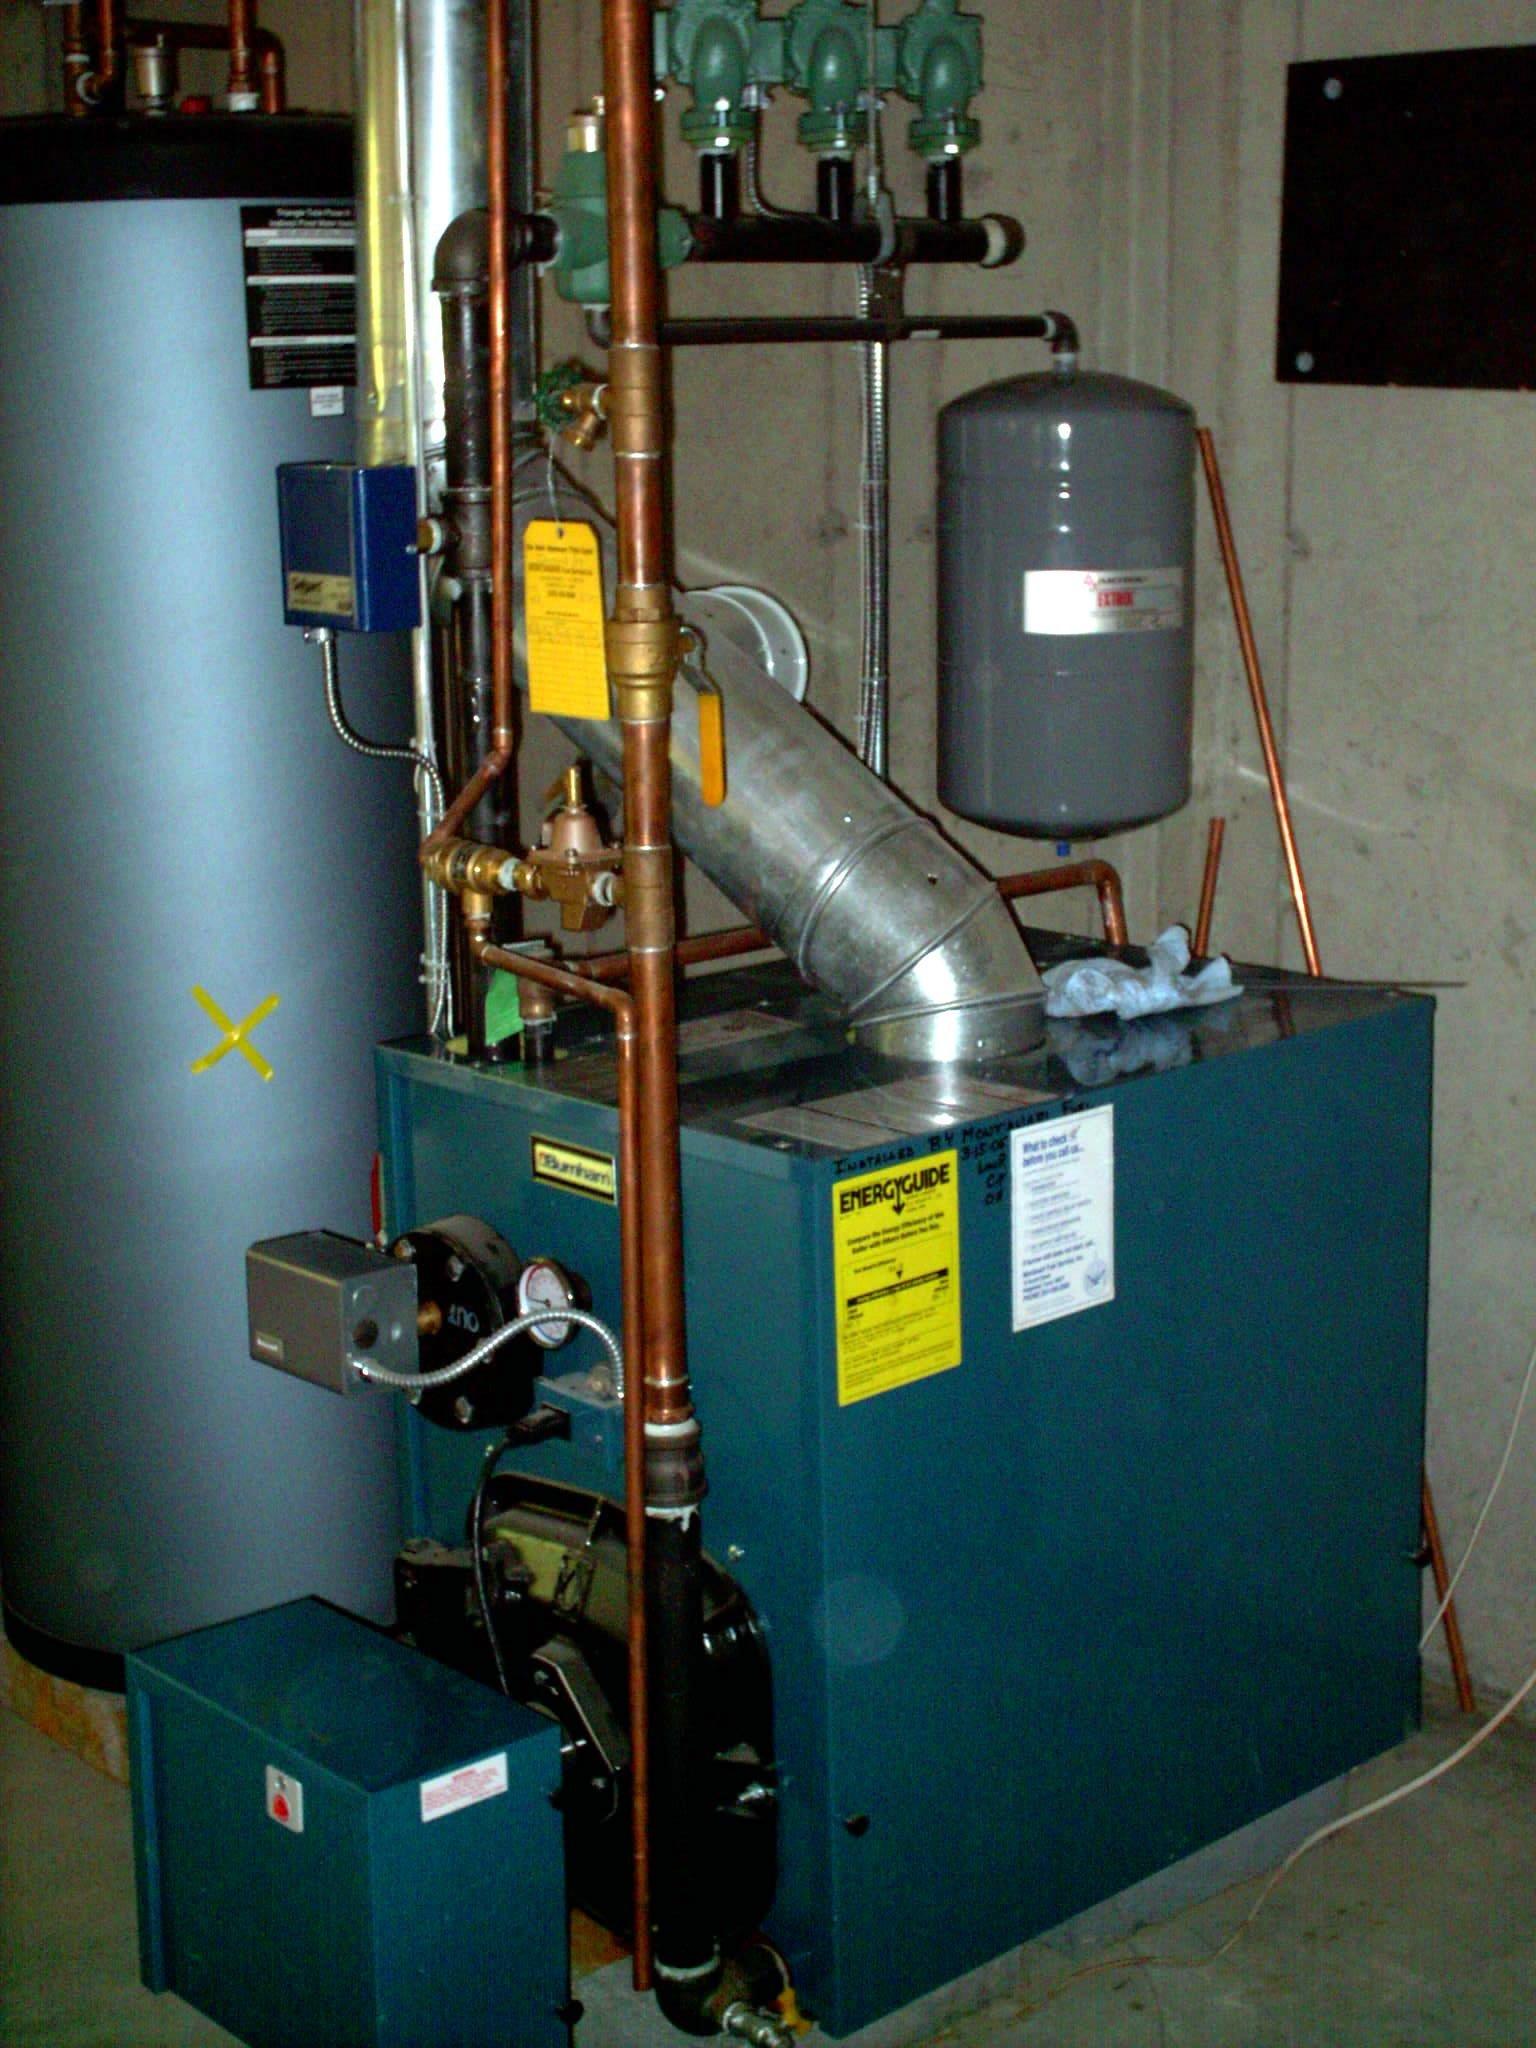 Montanari Fuel Service, Inc. image 4